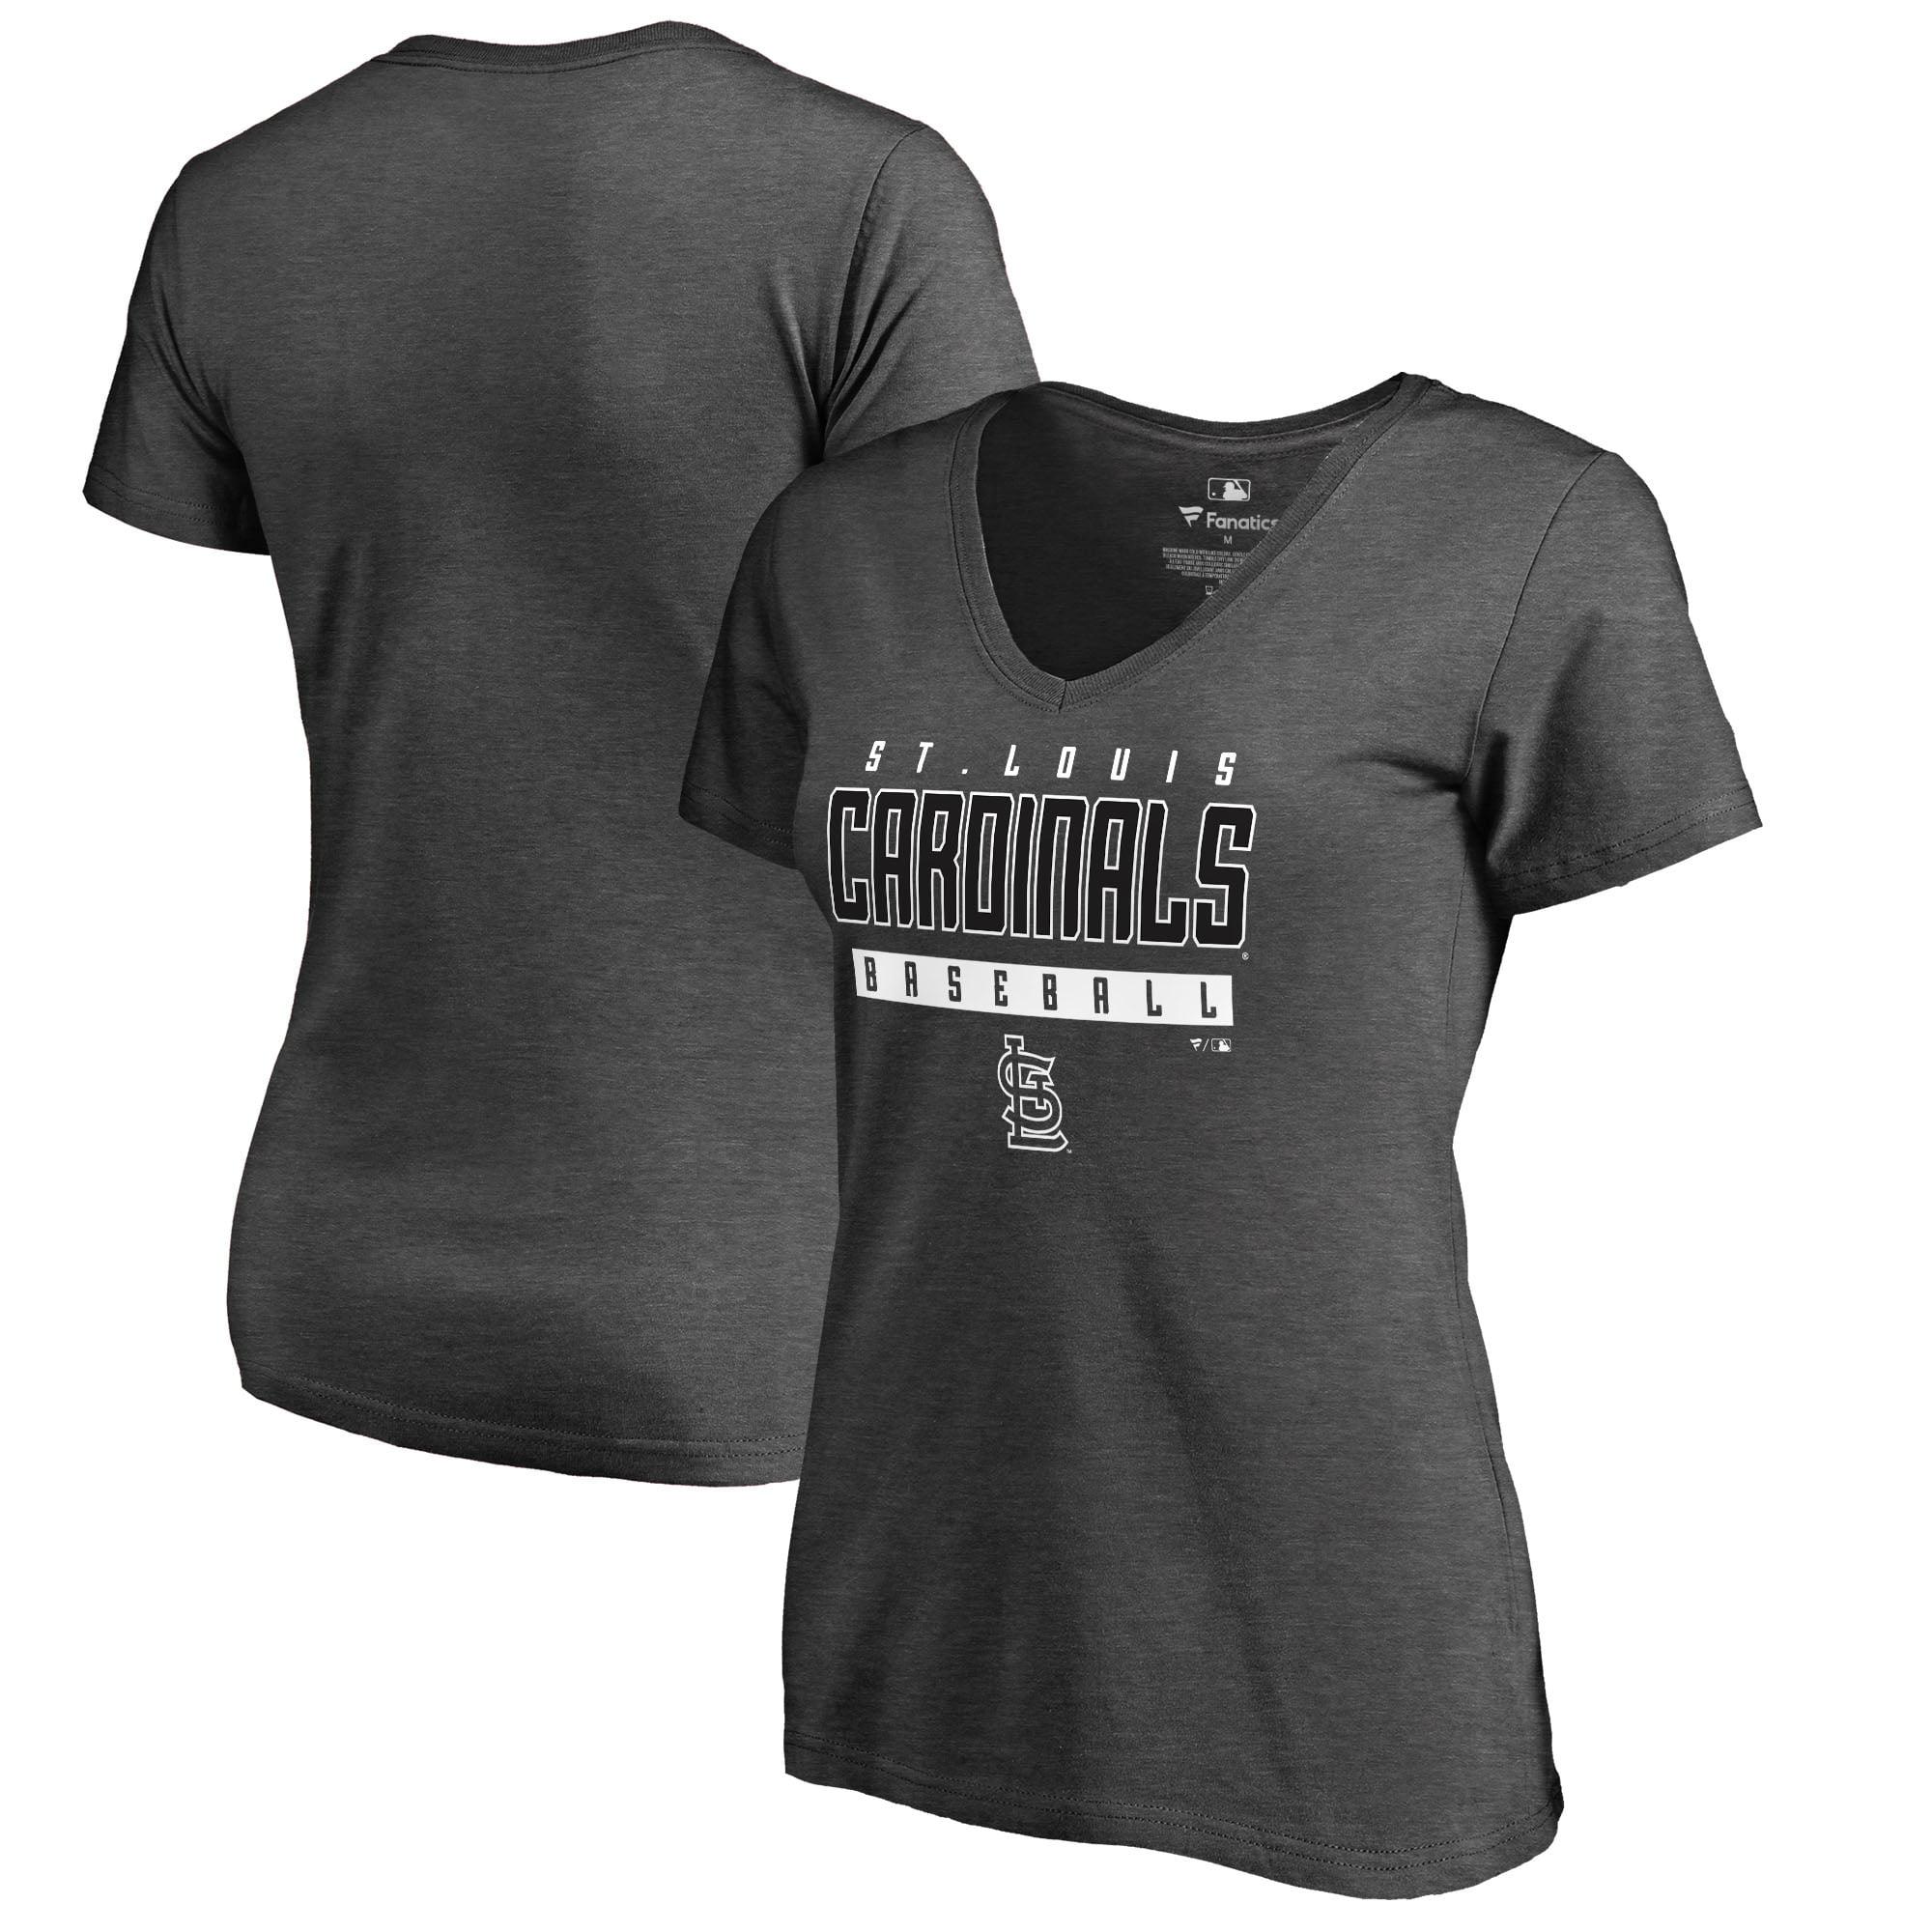 St. Louis Cardinals Fanatics Branded Women's Charcoal Stack V-Neck T-Shirt - Ash